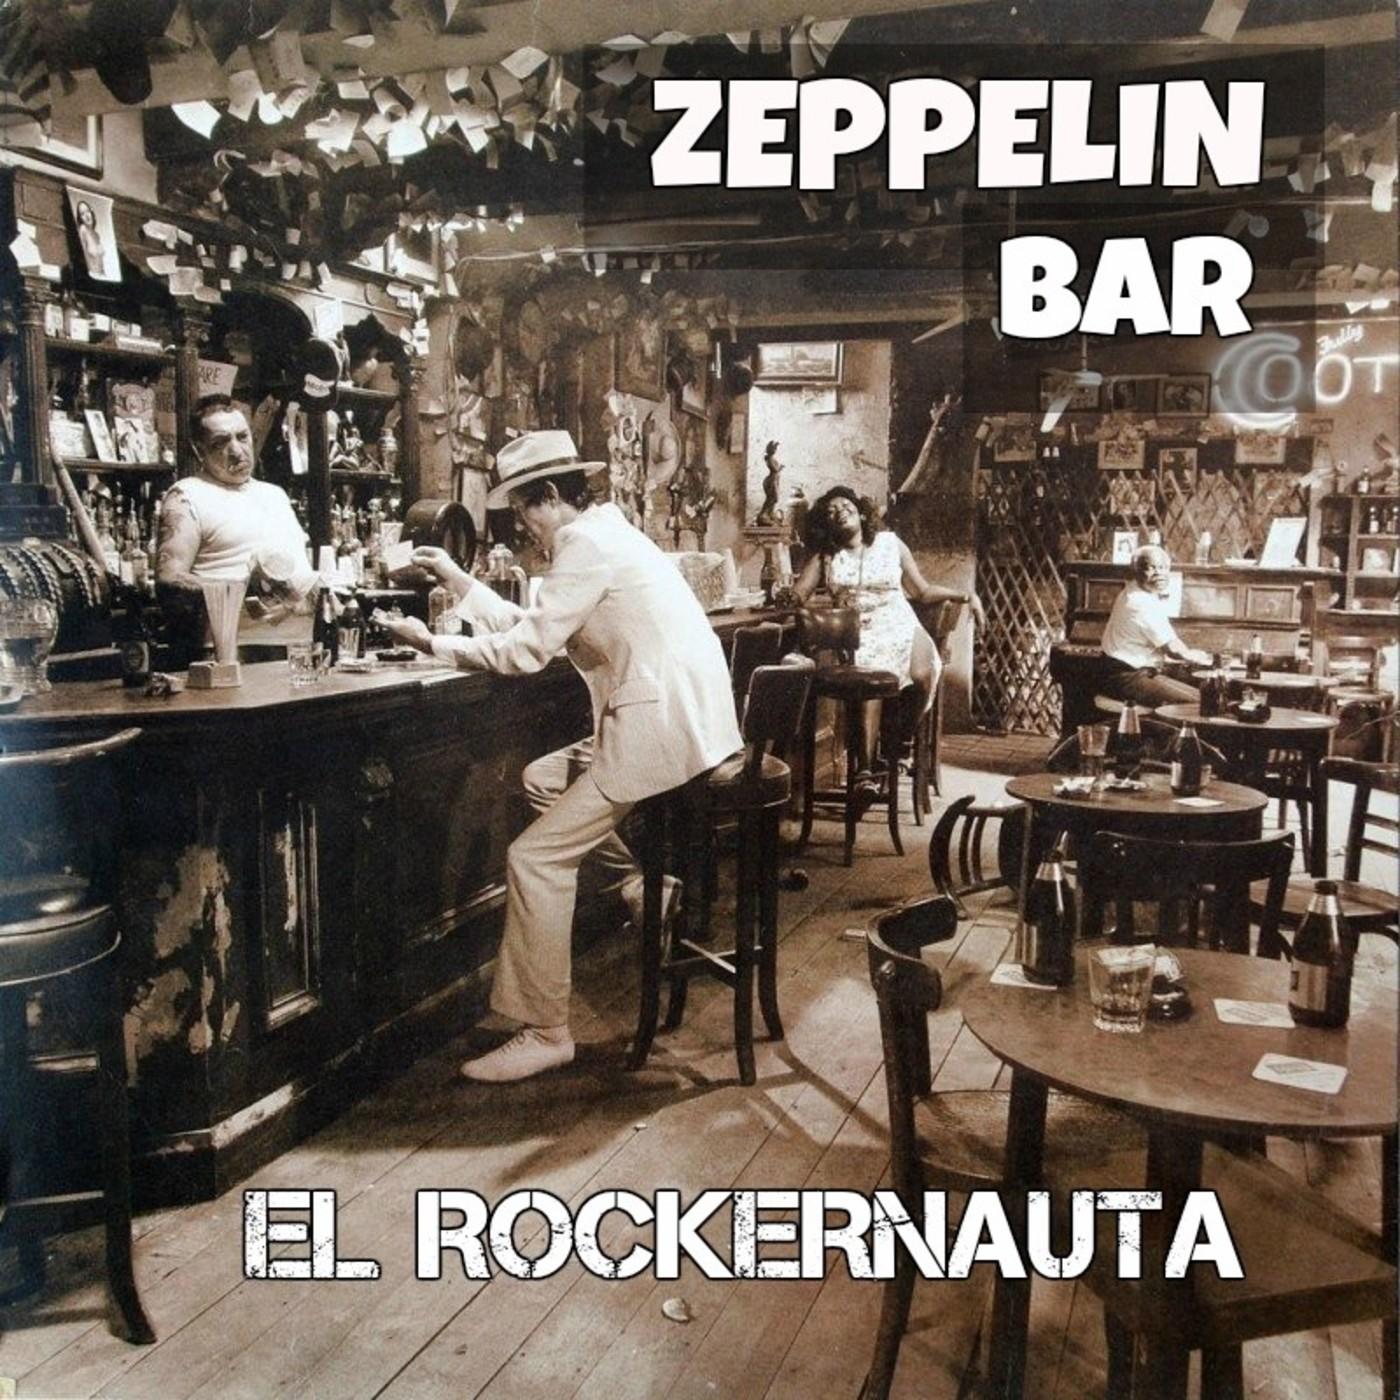 EL ROCKERNAUTA: Zeppelin Bar